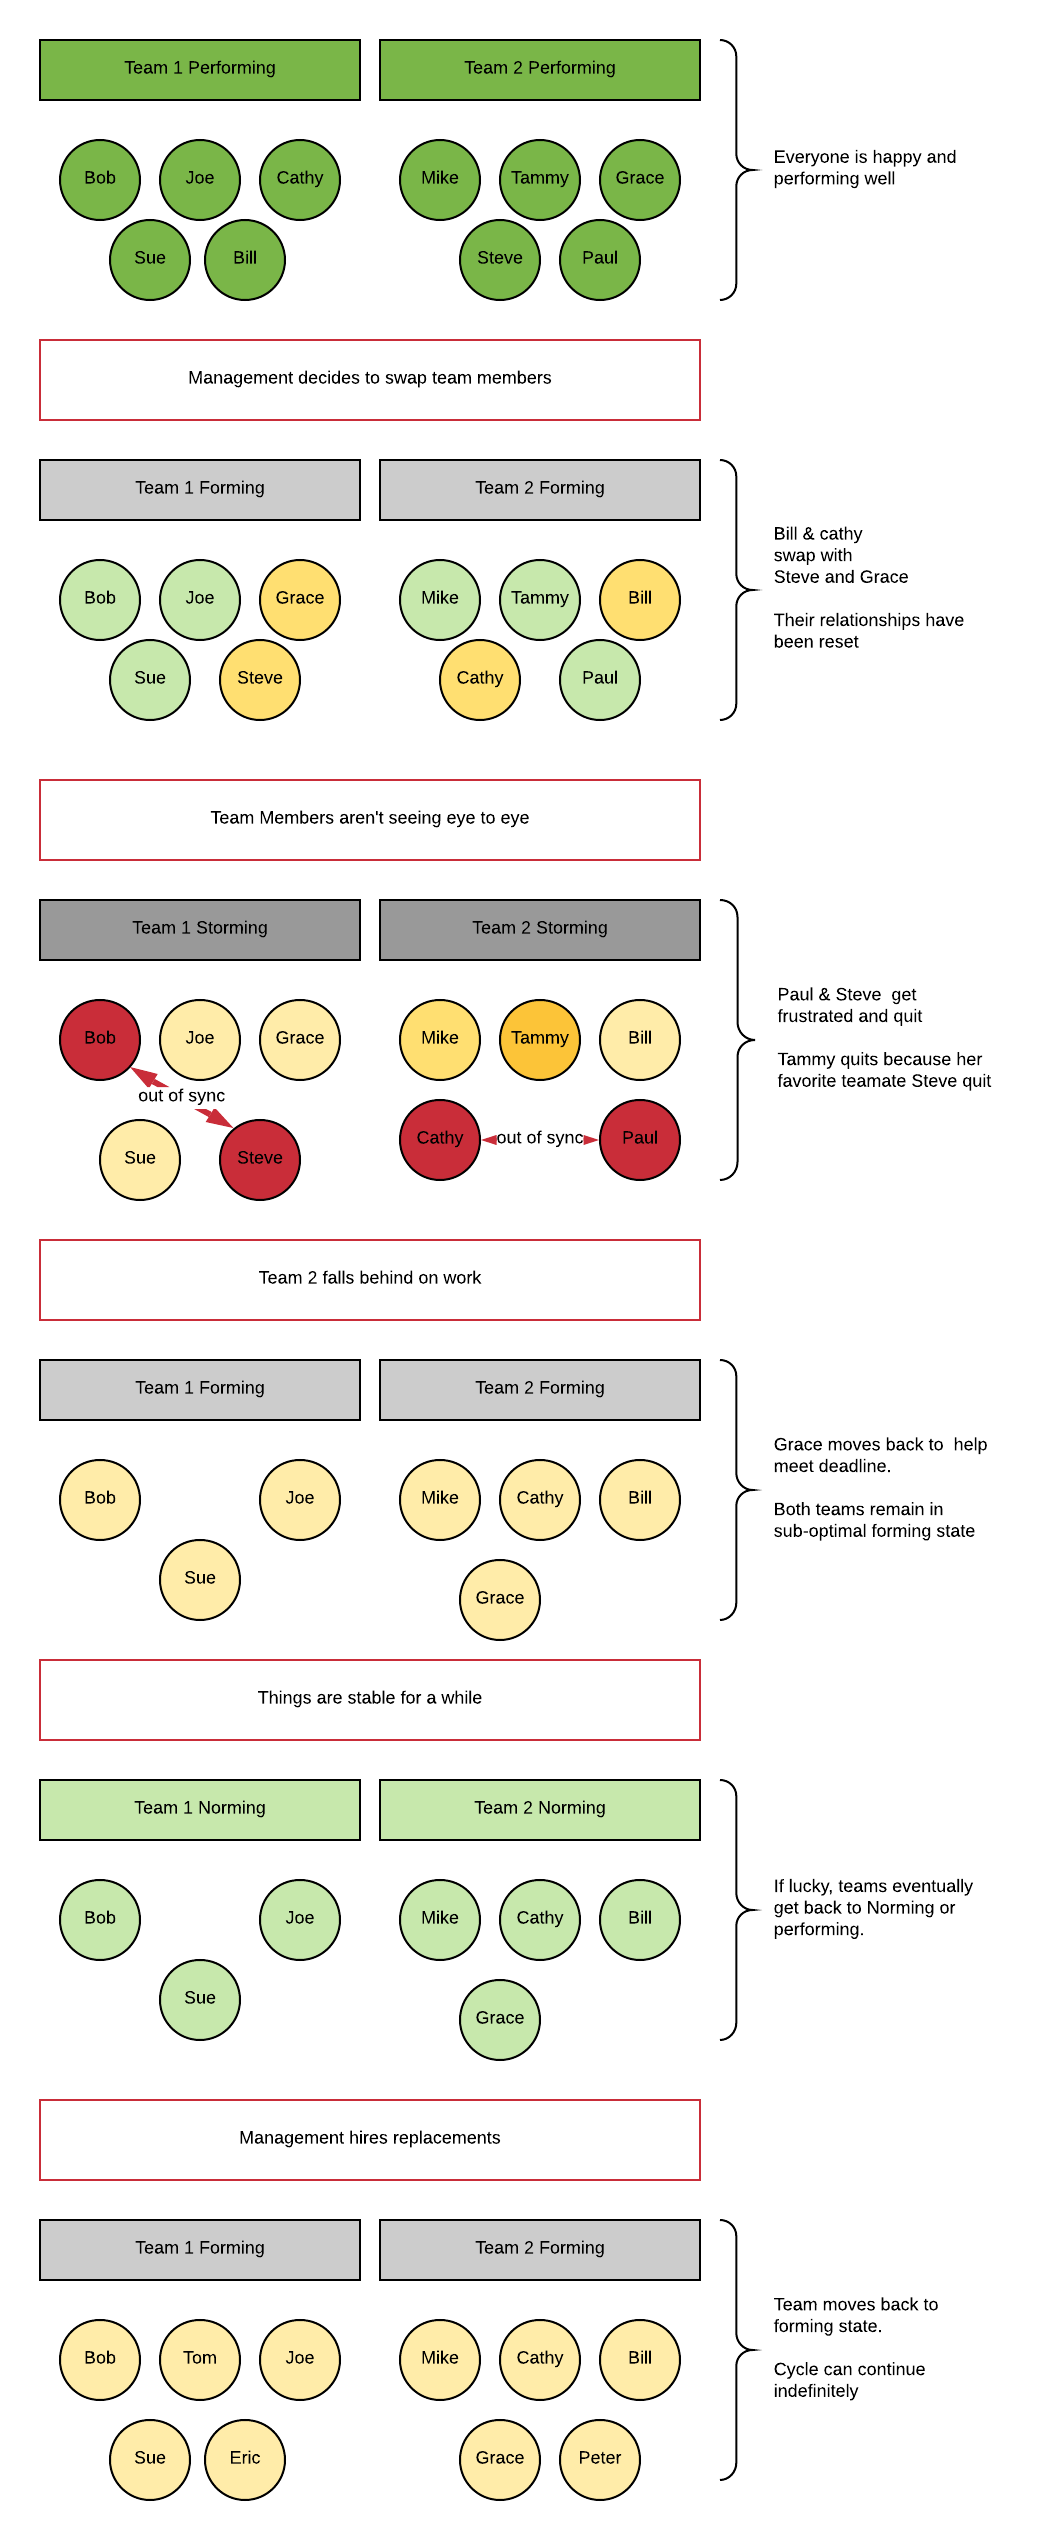 GroupCycleDynamics